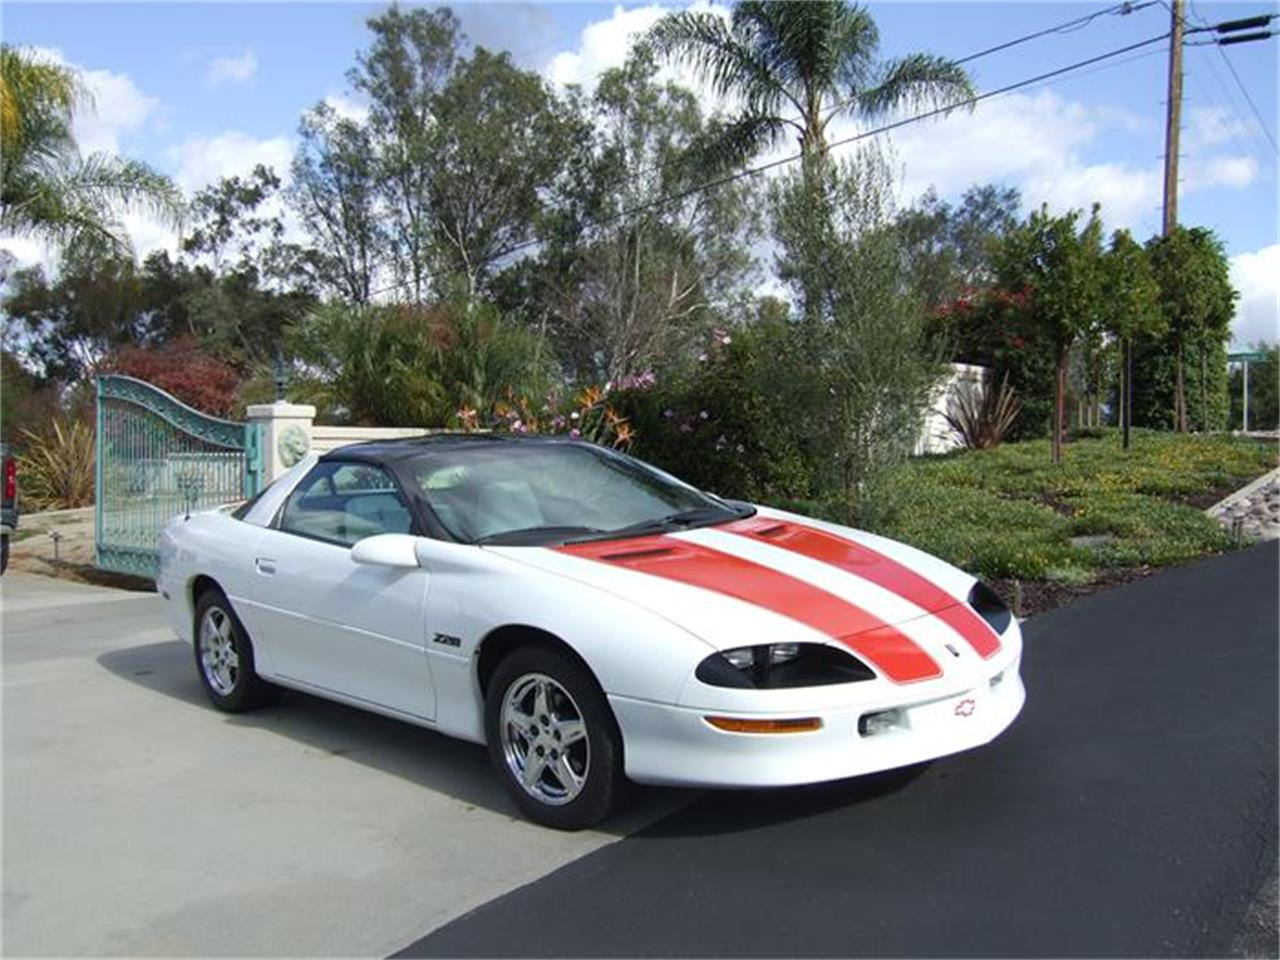 Large Picture of '97 Camaro Z28 located in Escondido California - $16,000.00 - B1LI